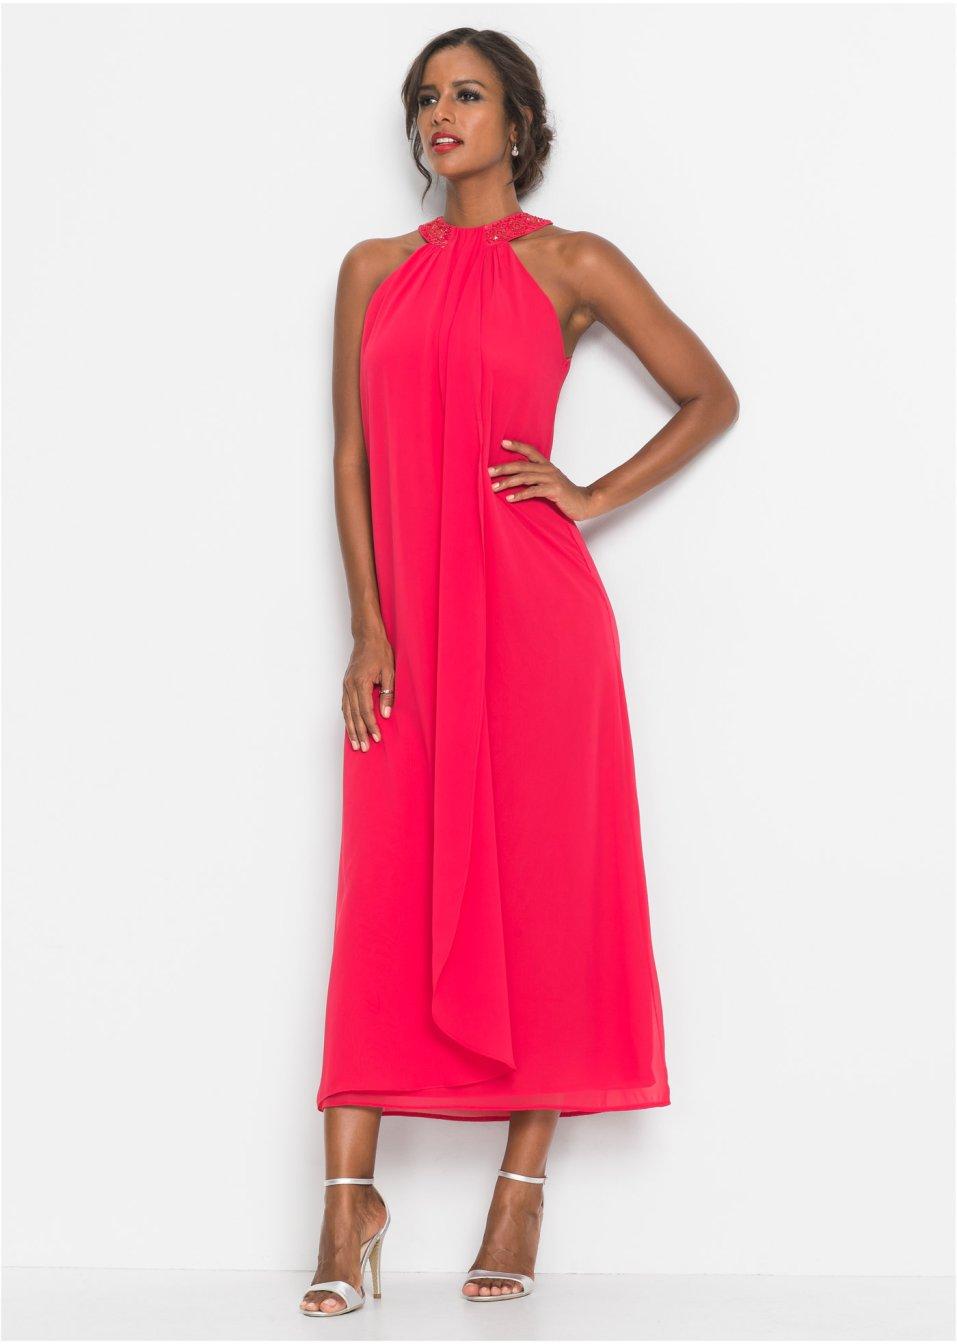 eccc20a2b248b1 Abendkleid mit Applikationen erdbeere - Damen - bonprix.de